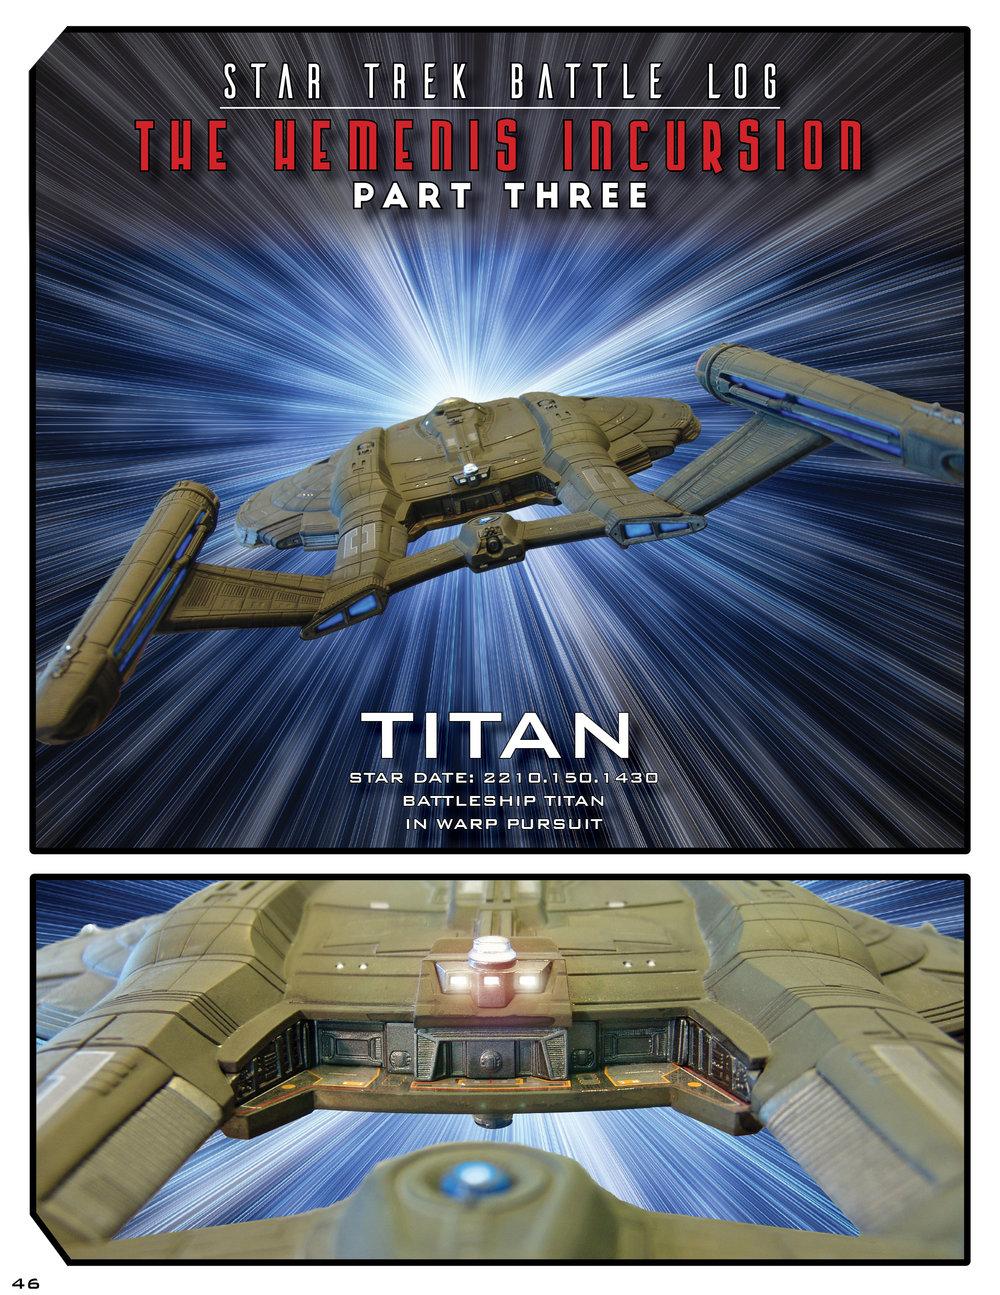 Star Trek_ Battle Logs Pages46.jpg